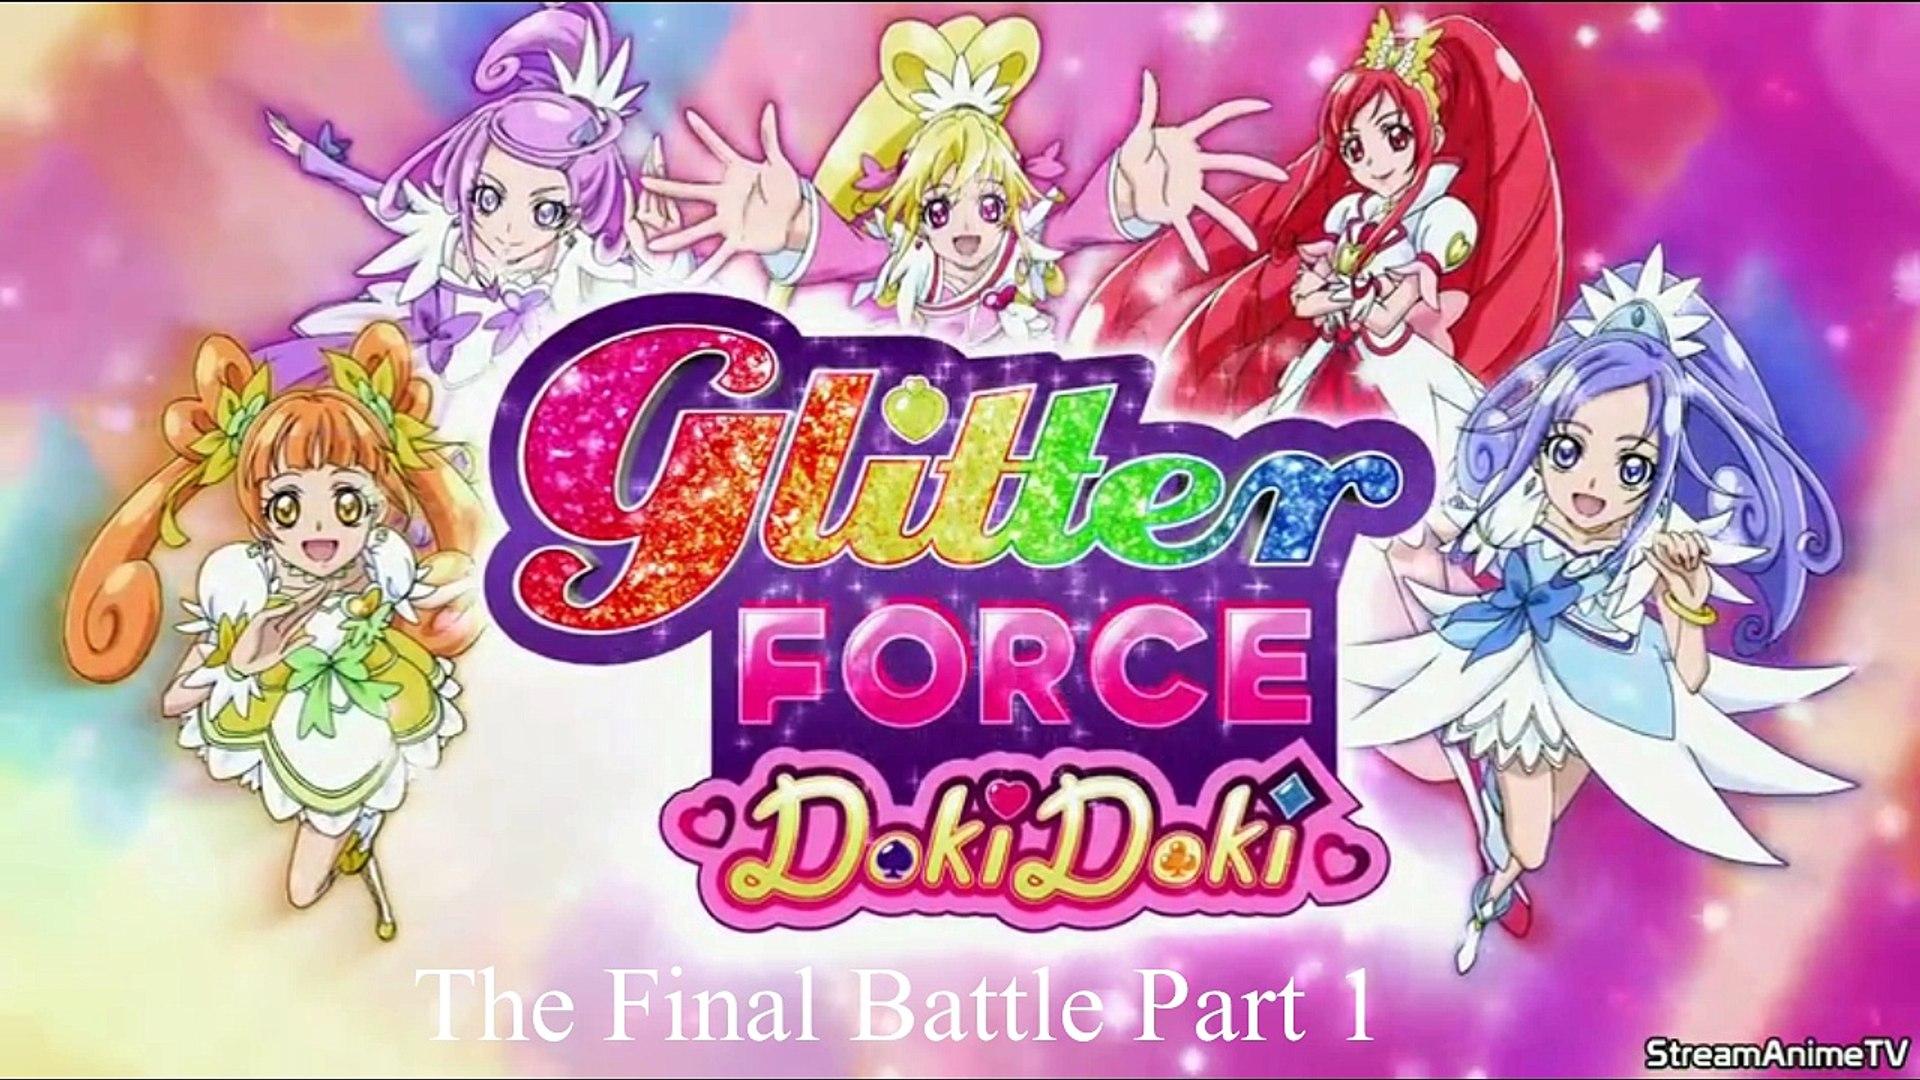 Glitter Force Doki Doki The Final Battle Part 1 2 Video Dailymotion